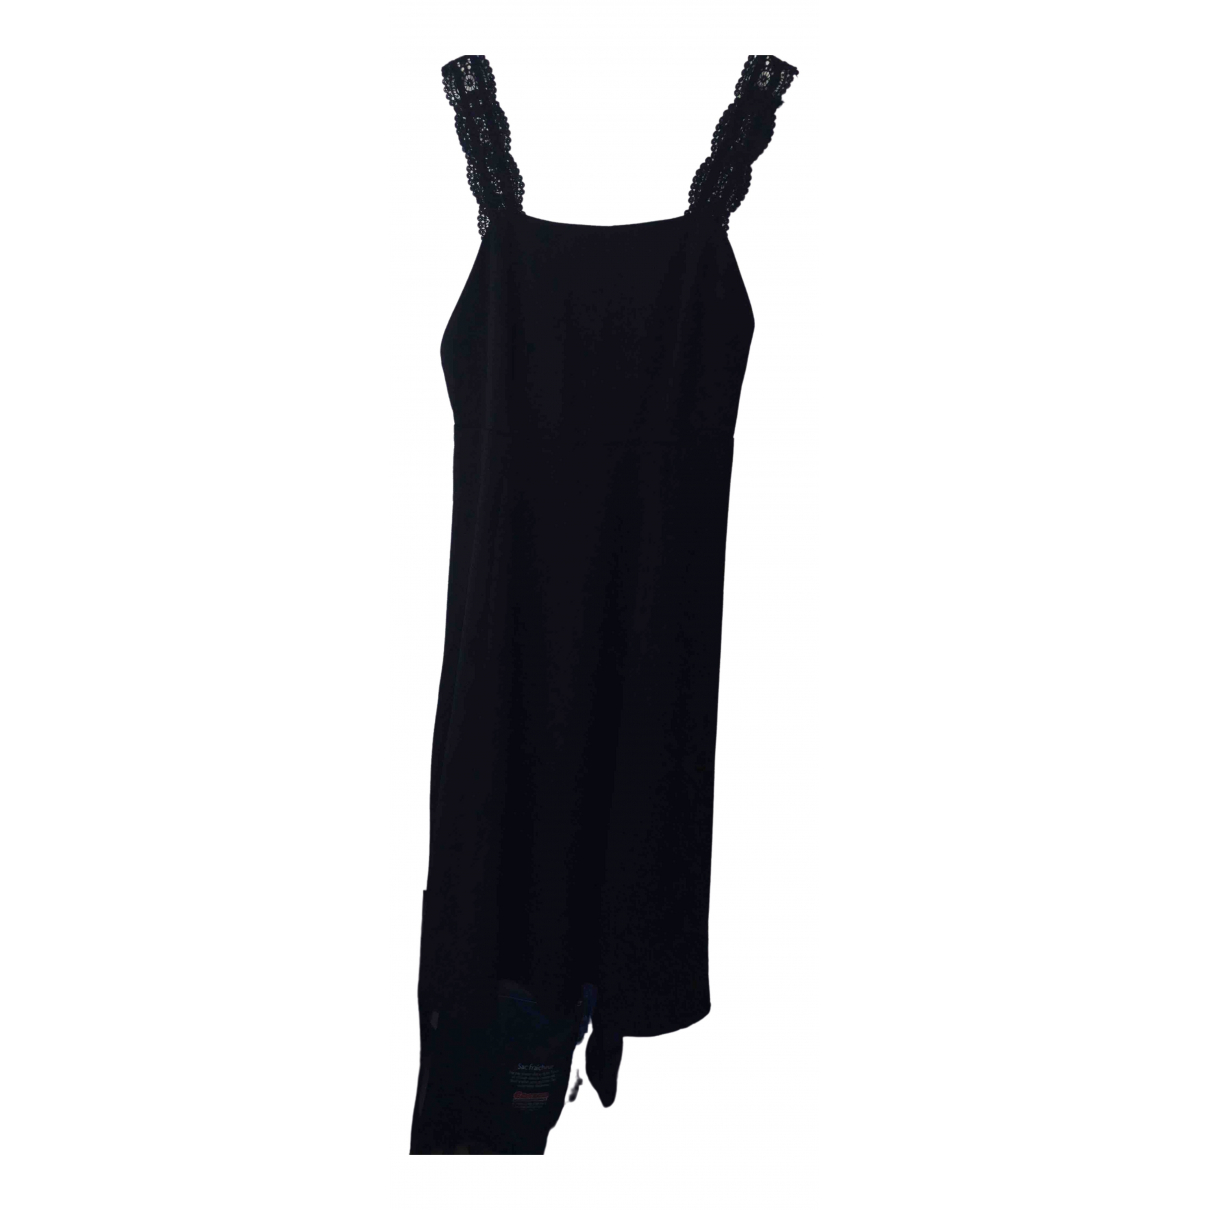 Sézane Spring Summer 2020 Black dress for Women 38 FR